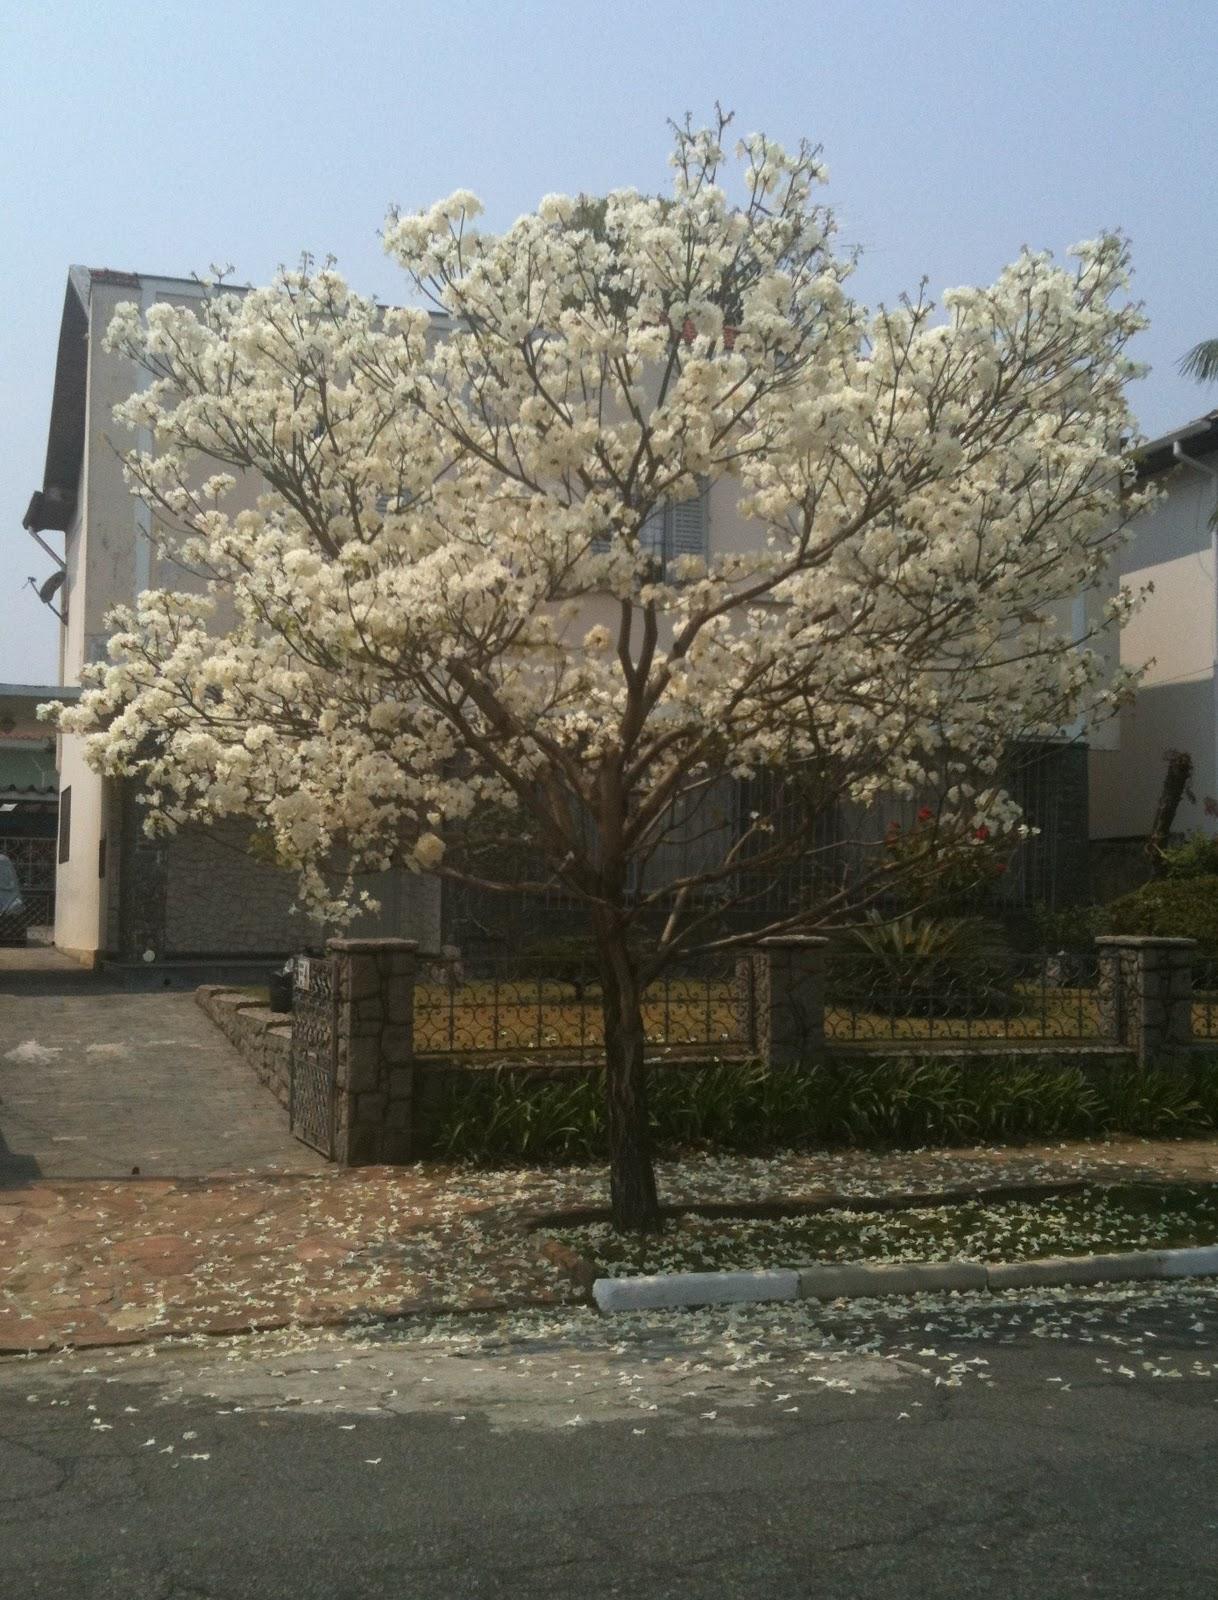 ipe de jardim arvore : ipe de jardim arvore:Verde Jardim: Dia da árvore